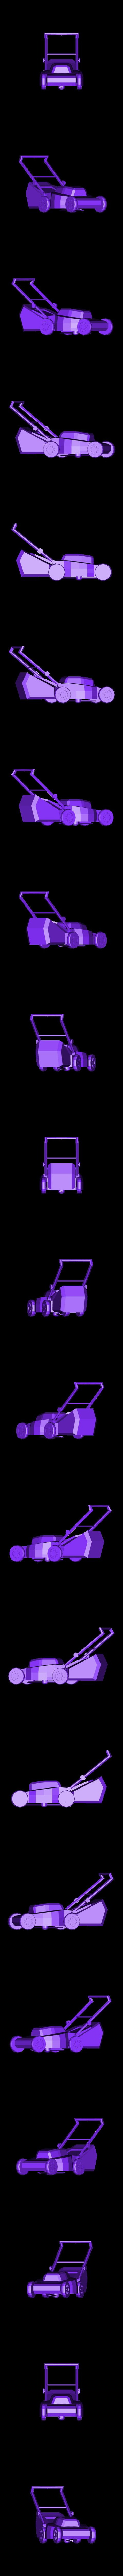 1317 Lawn Mower.obj Download free OBJ file Lawn mower • 3D printable design, Colorful3D